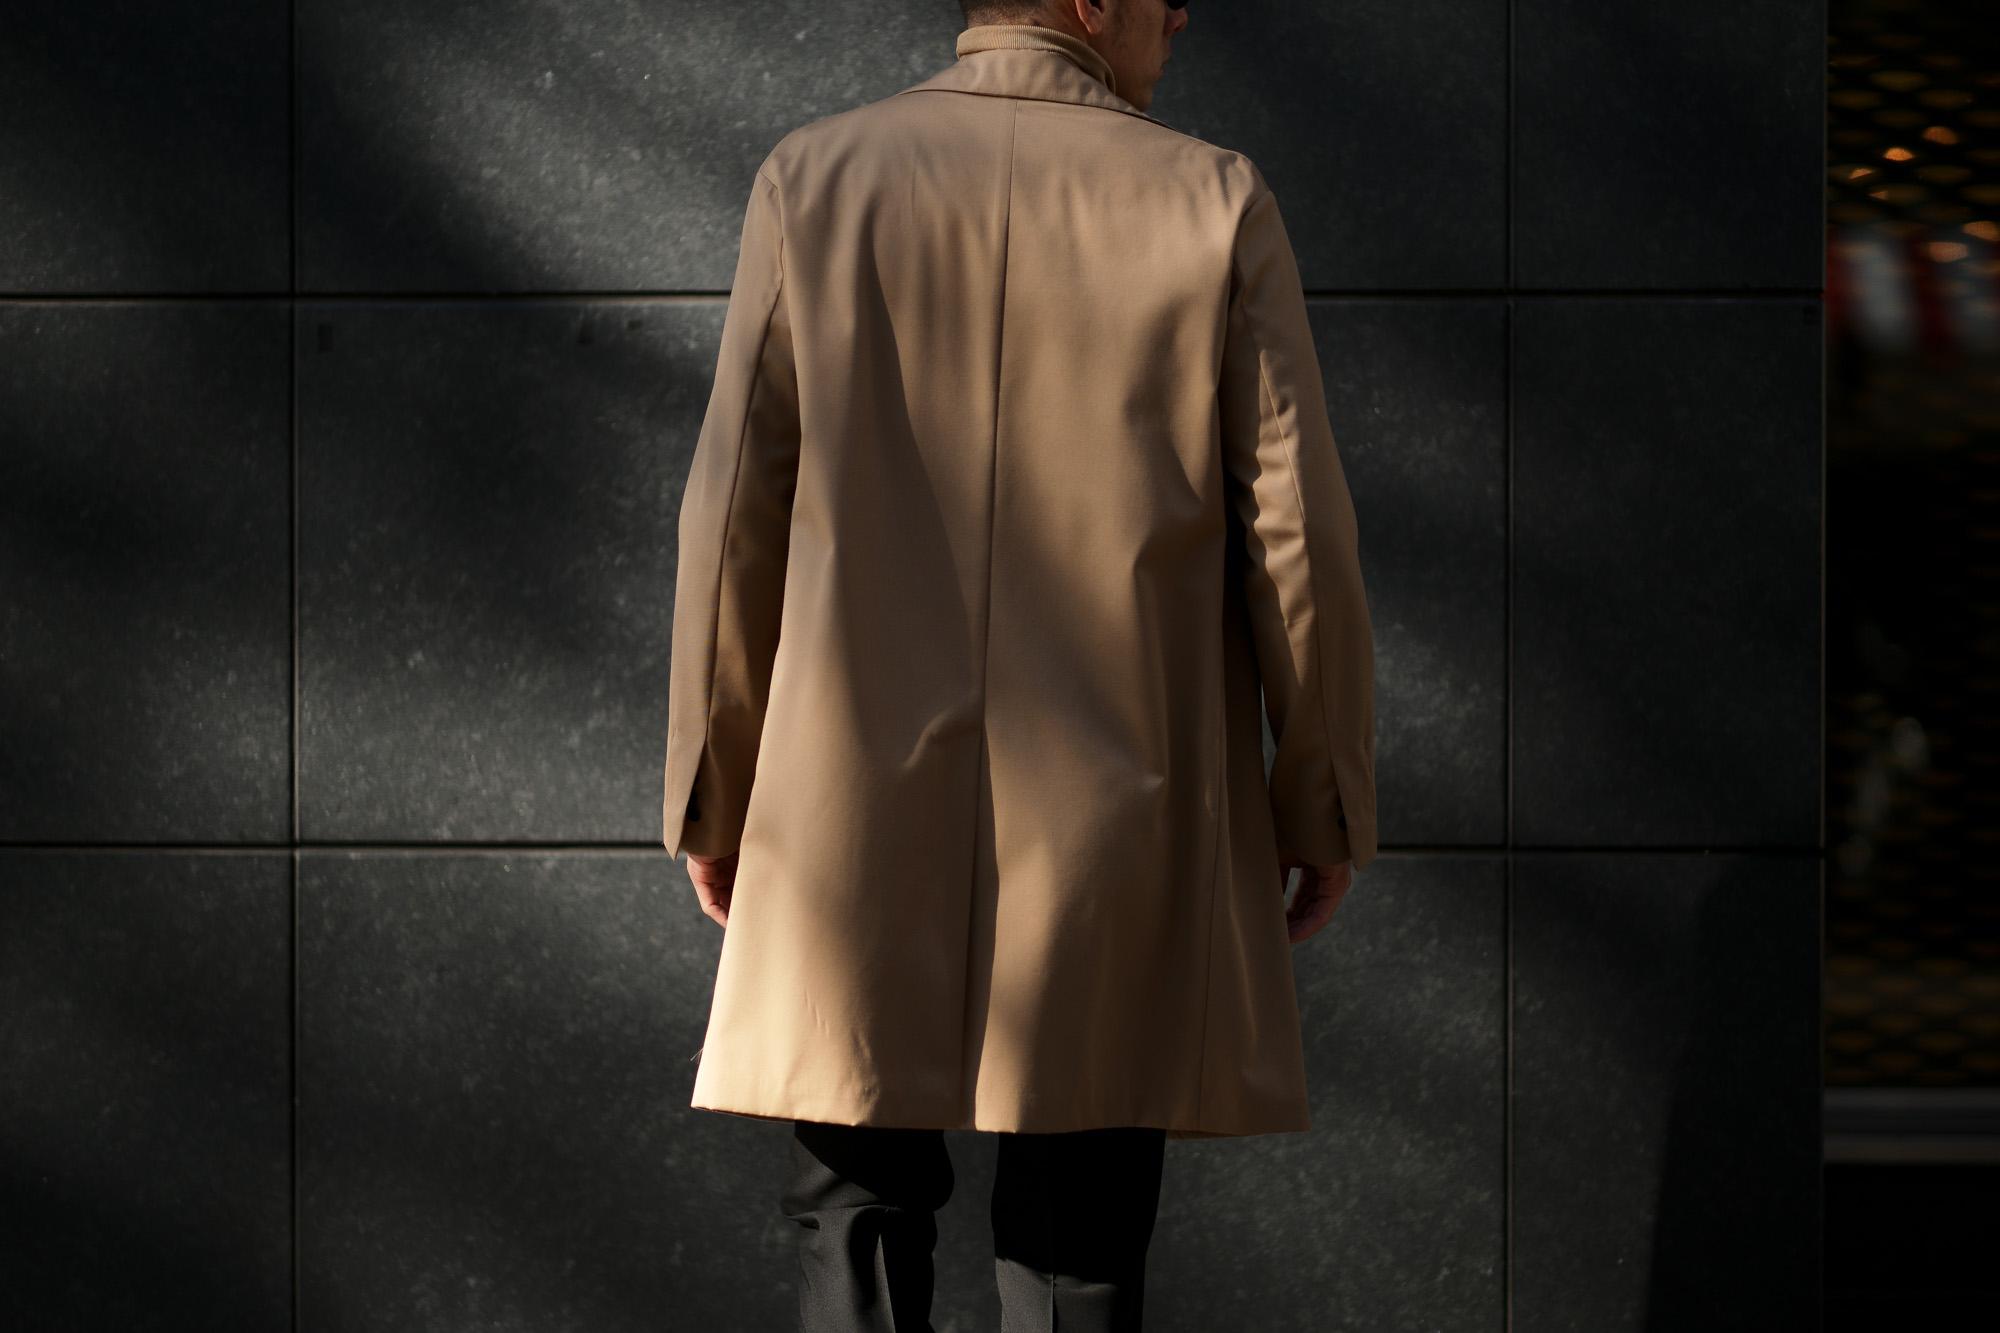 BELVEST (ベルベスト) Capsule New Chester Coat コットンウールギャバジン チェスターコート BEIGE (ベージュ) Made in italy (イタリア製) 2020 春夏新作 愛知 名古屋 altoediritto アルトエデリット